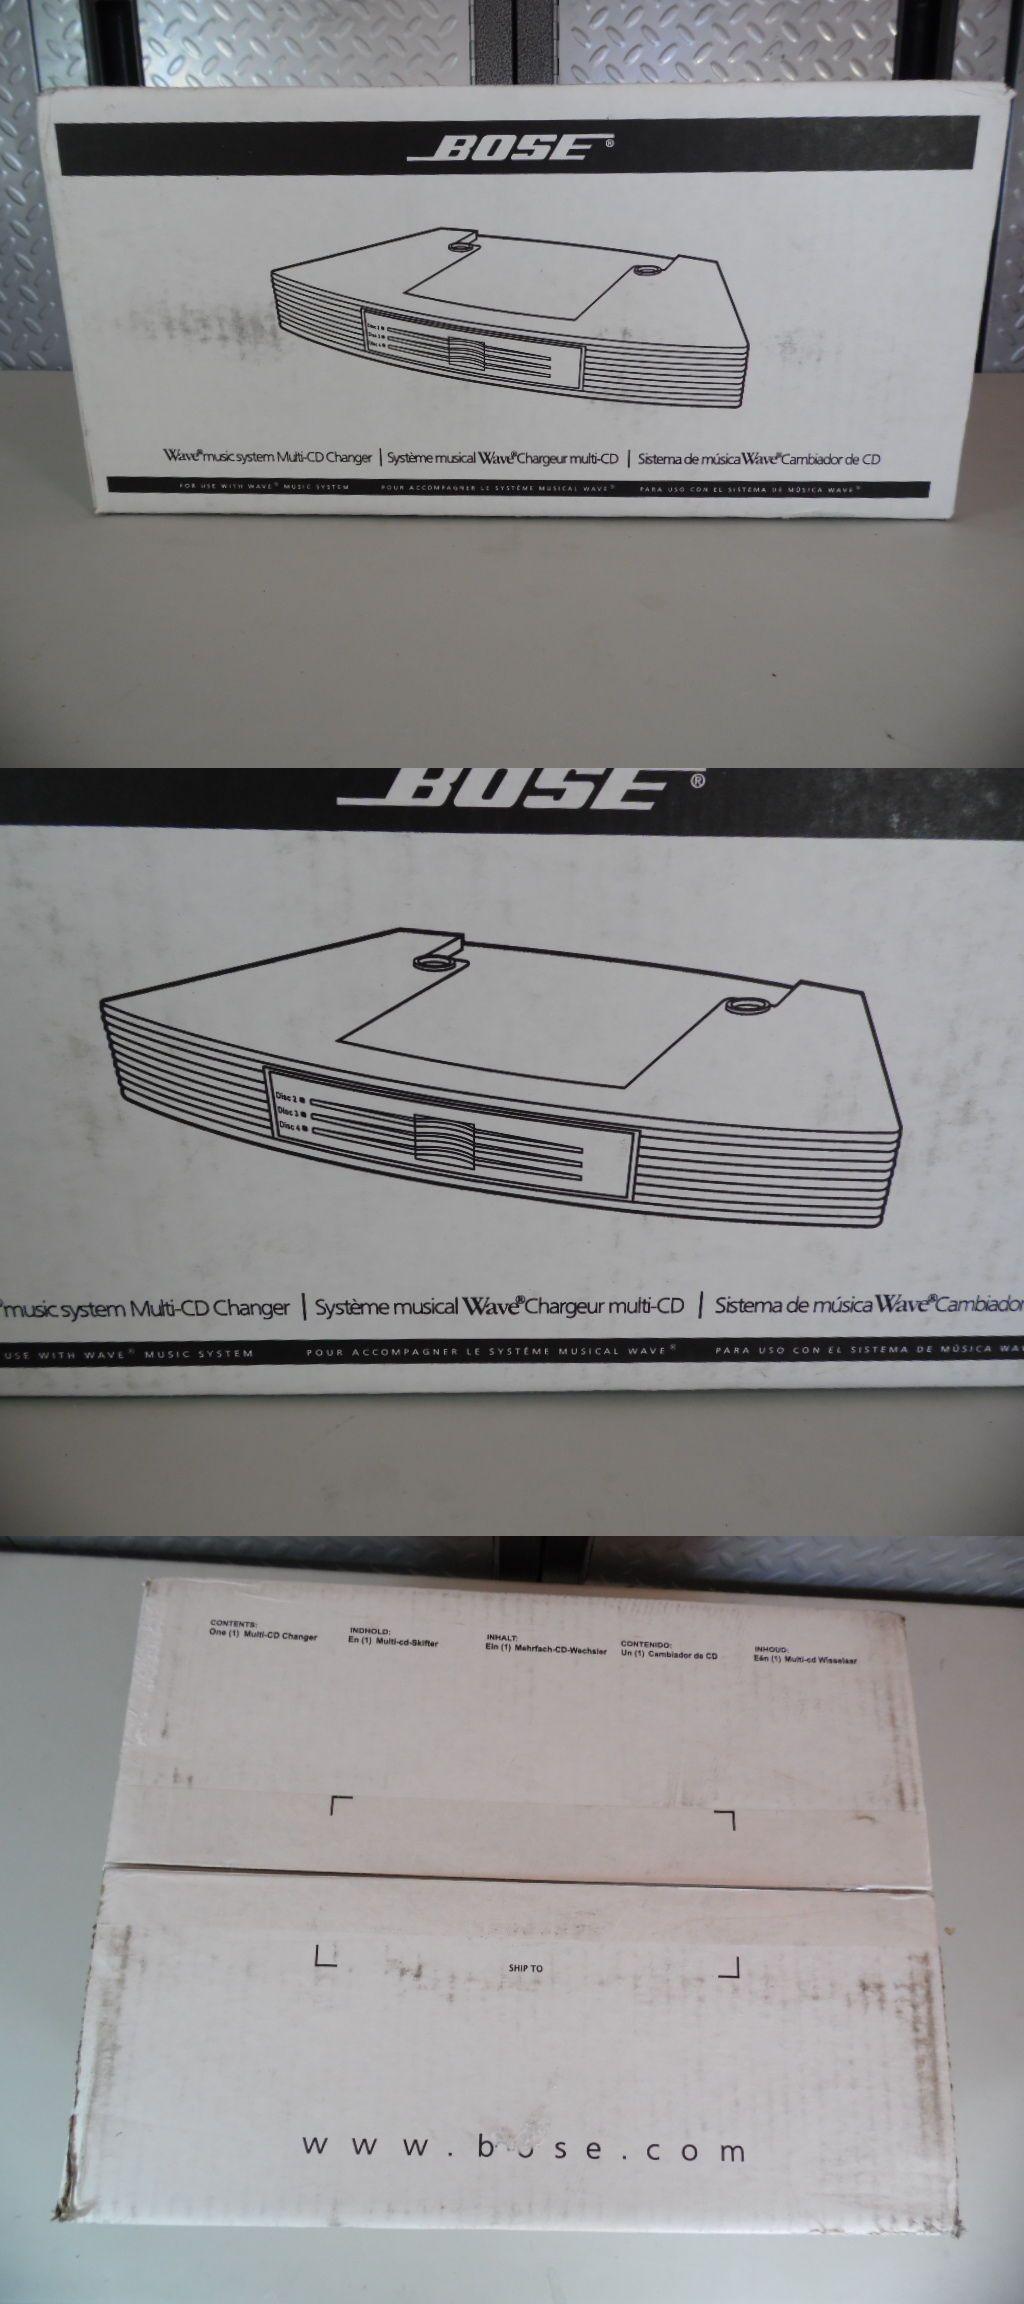 compact and shelf stereos new bose wave multi 3 cd changer manual rh pinterest co uk Bose Radio and CD Changer Bose Wave CD Changer